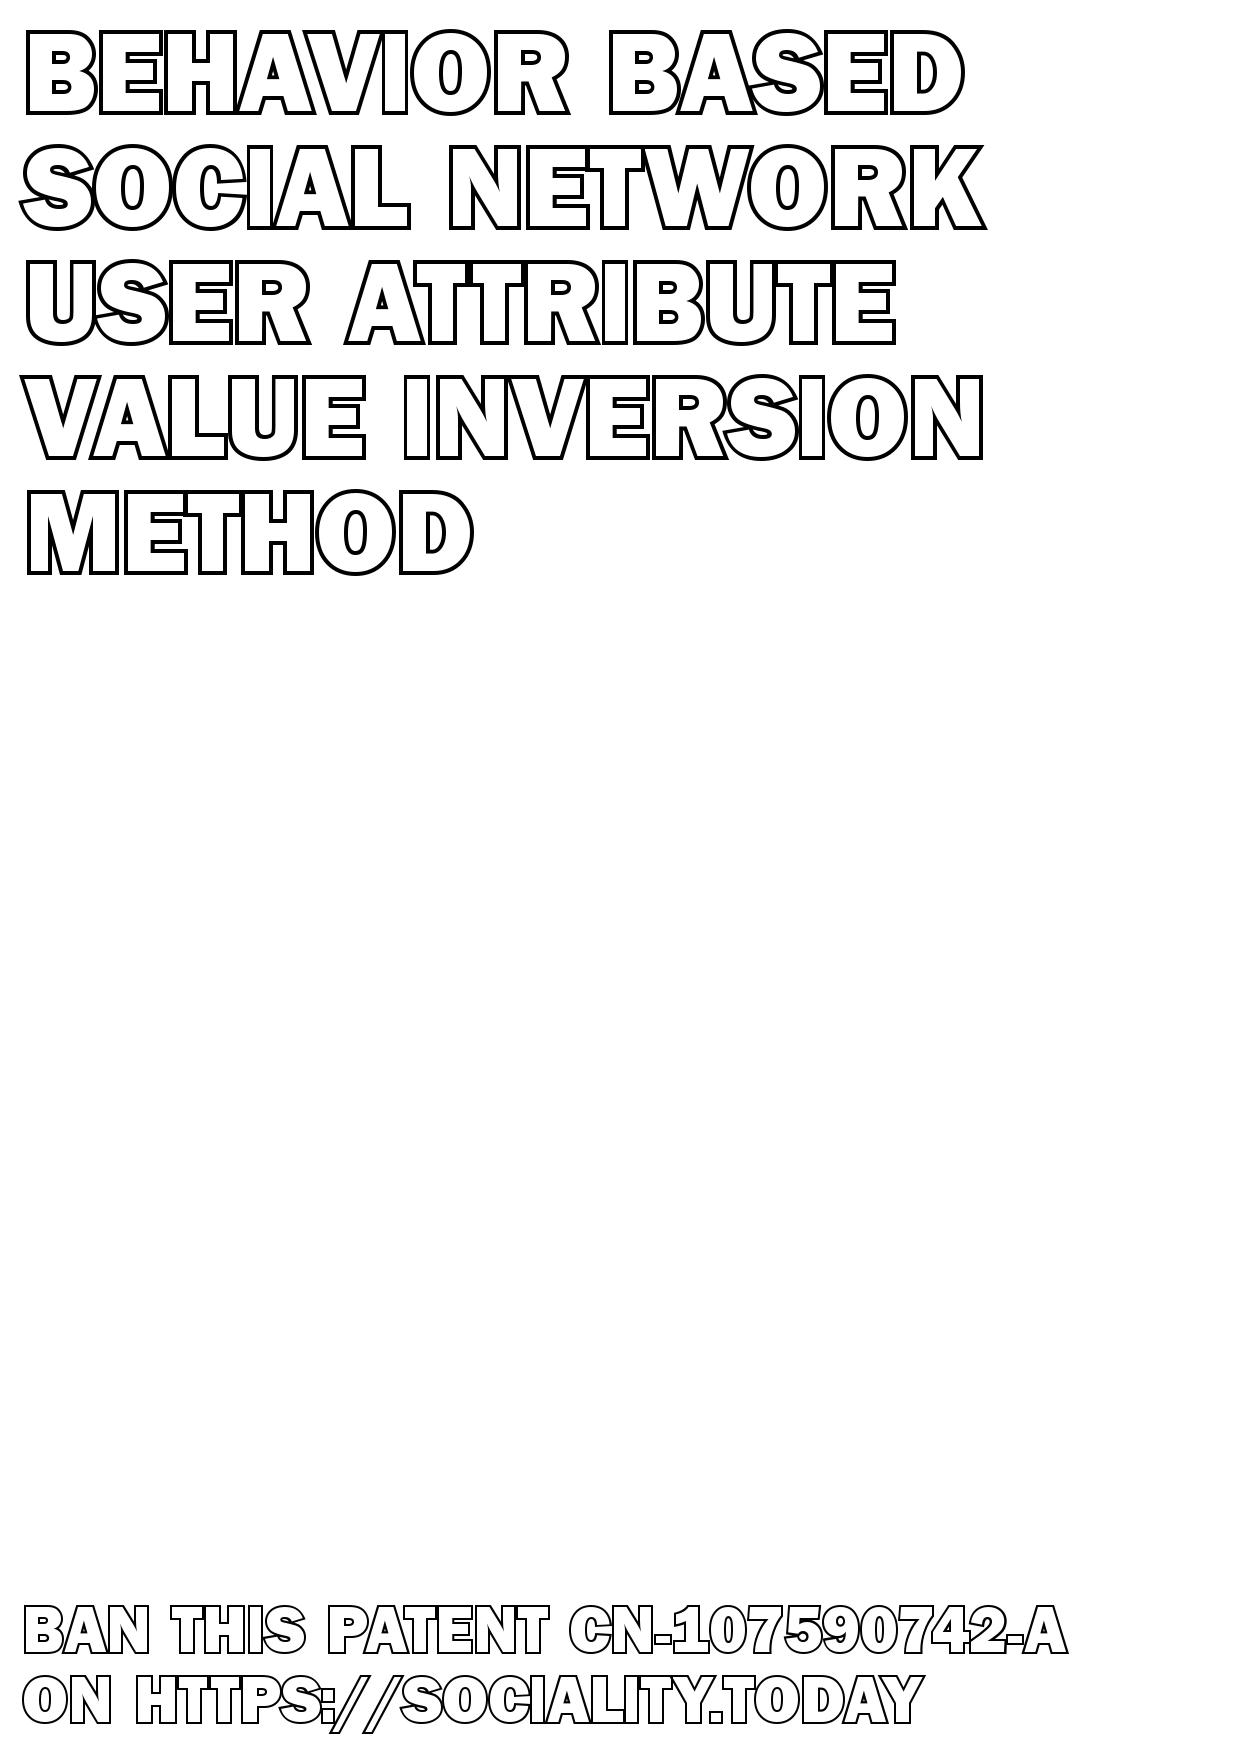 Behavior based social network user attribute value inversion method  - CN-107590742-A